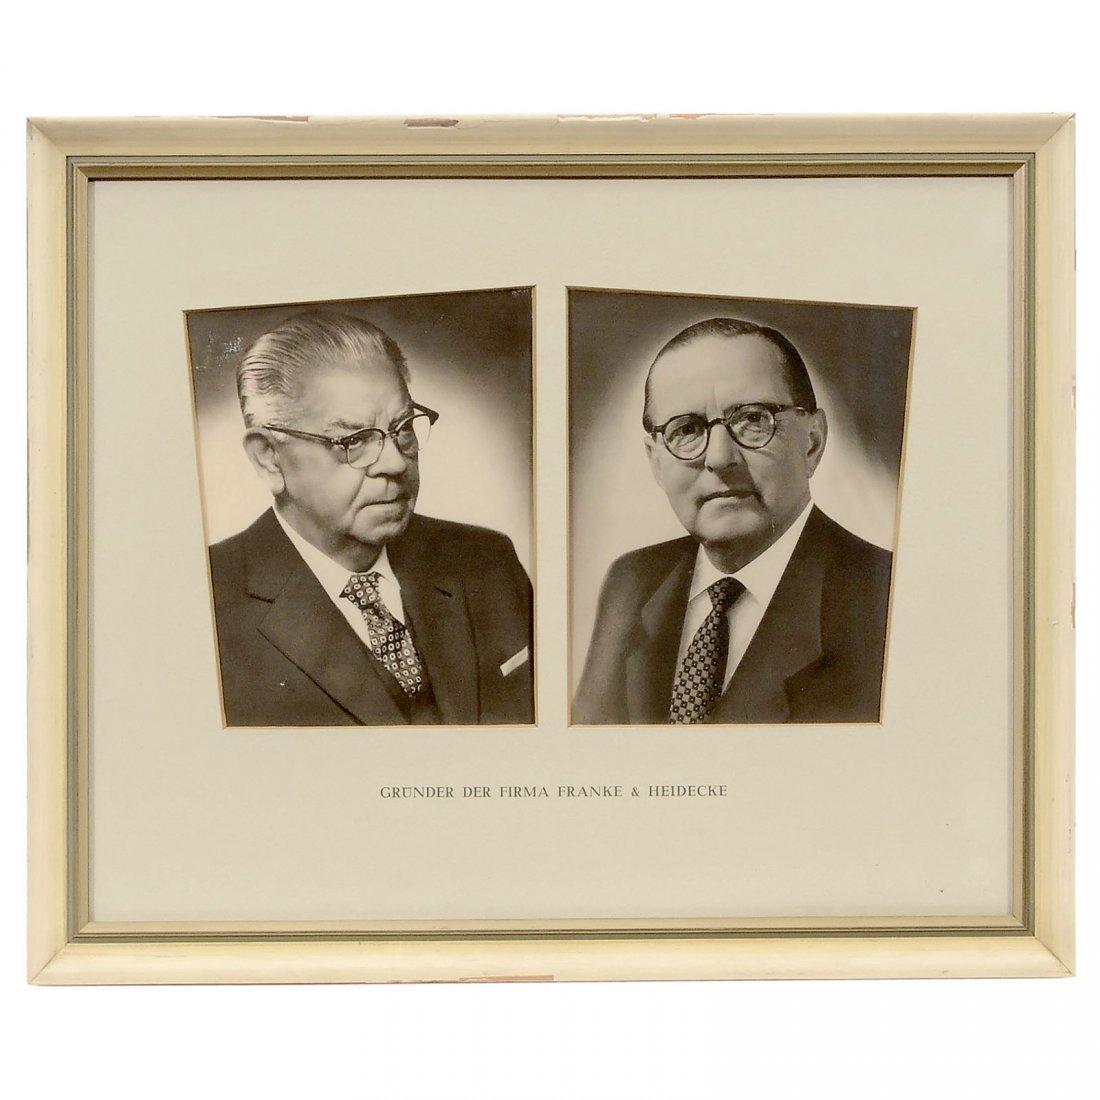 Portrait Photographs by Franke & Heidecke, 1950s - 3